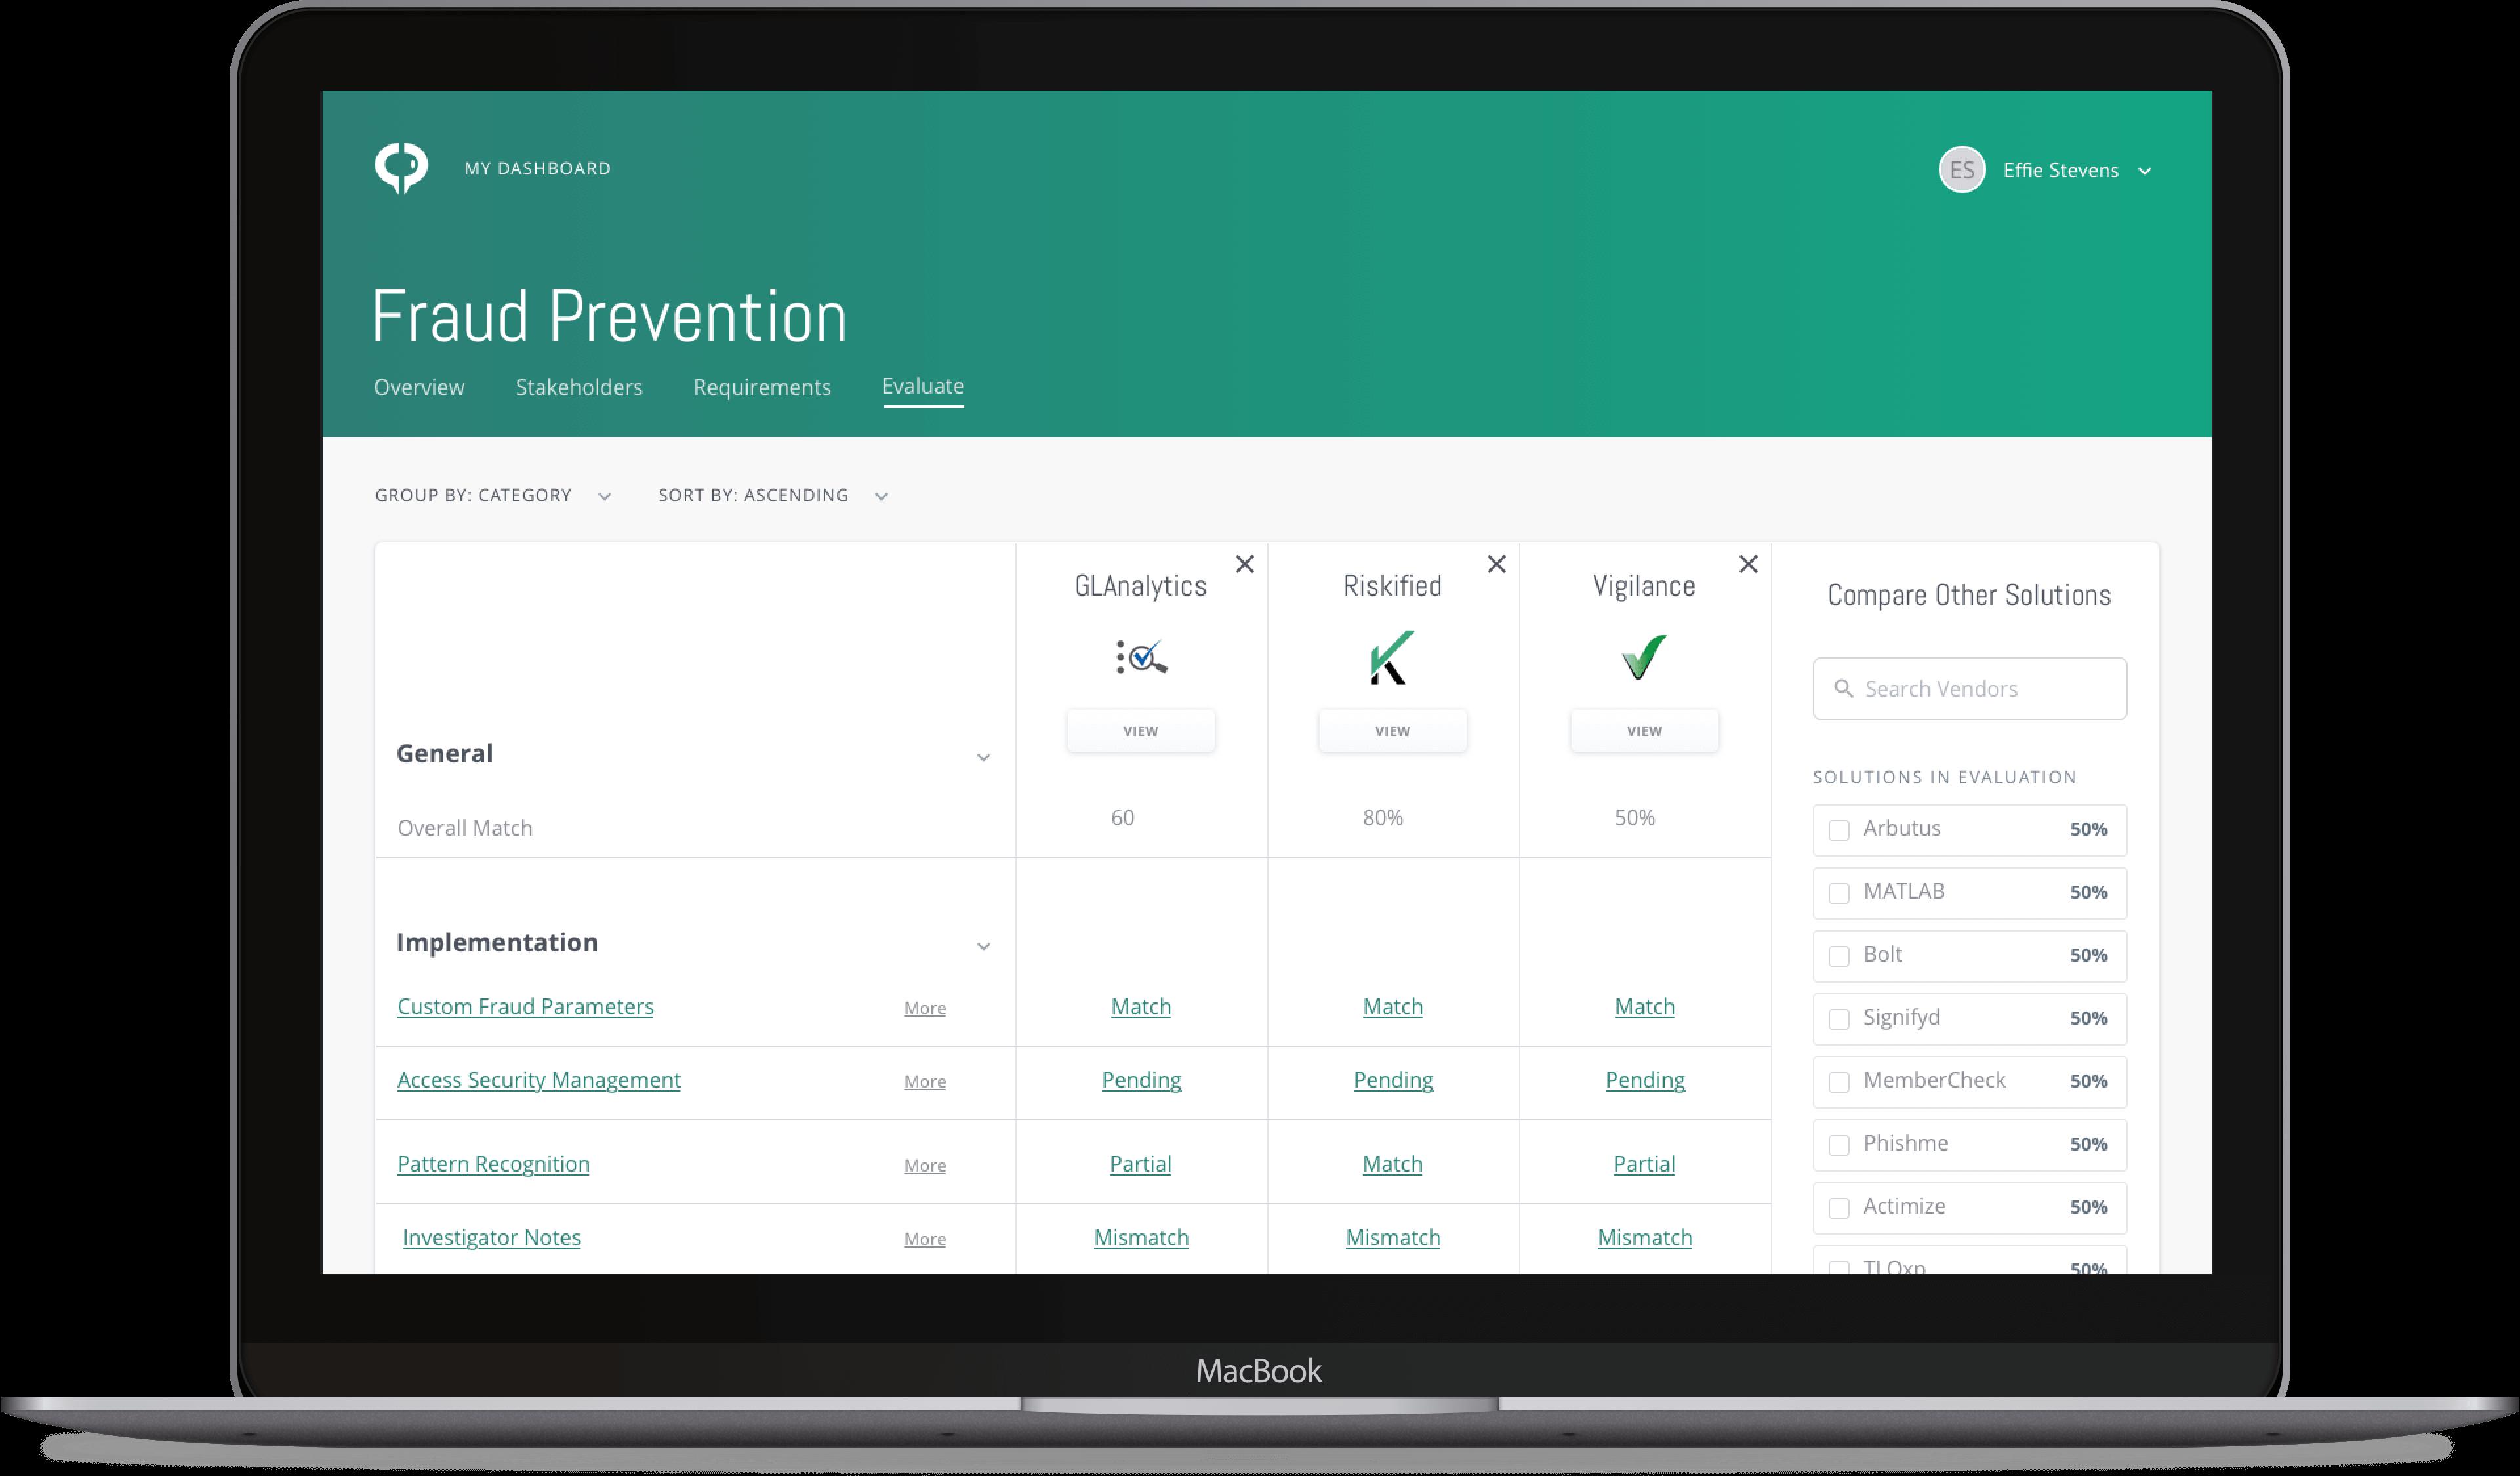 Stakeholder evaluation grid